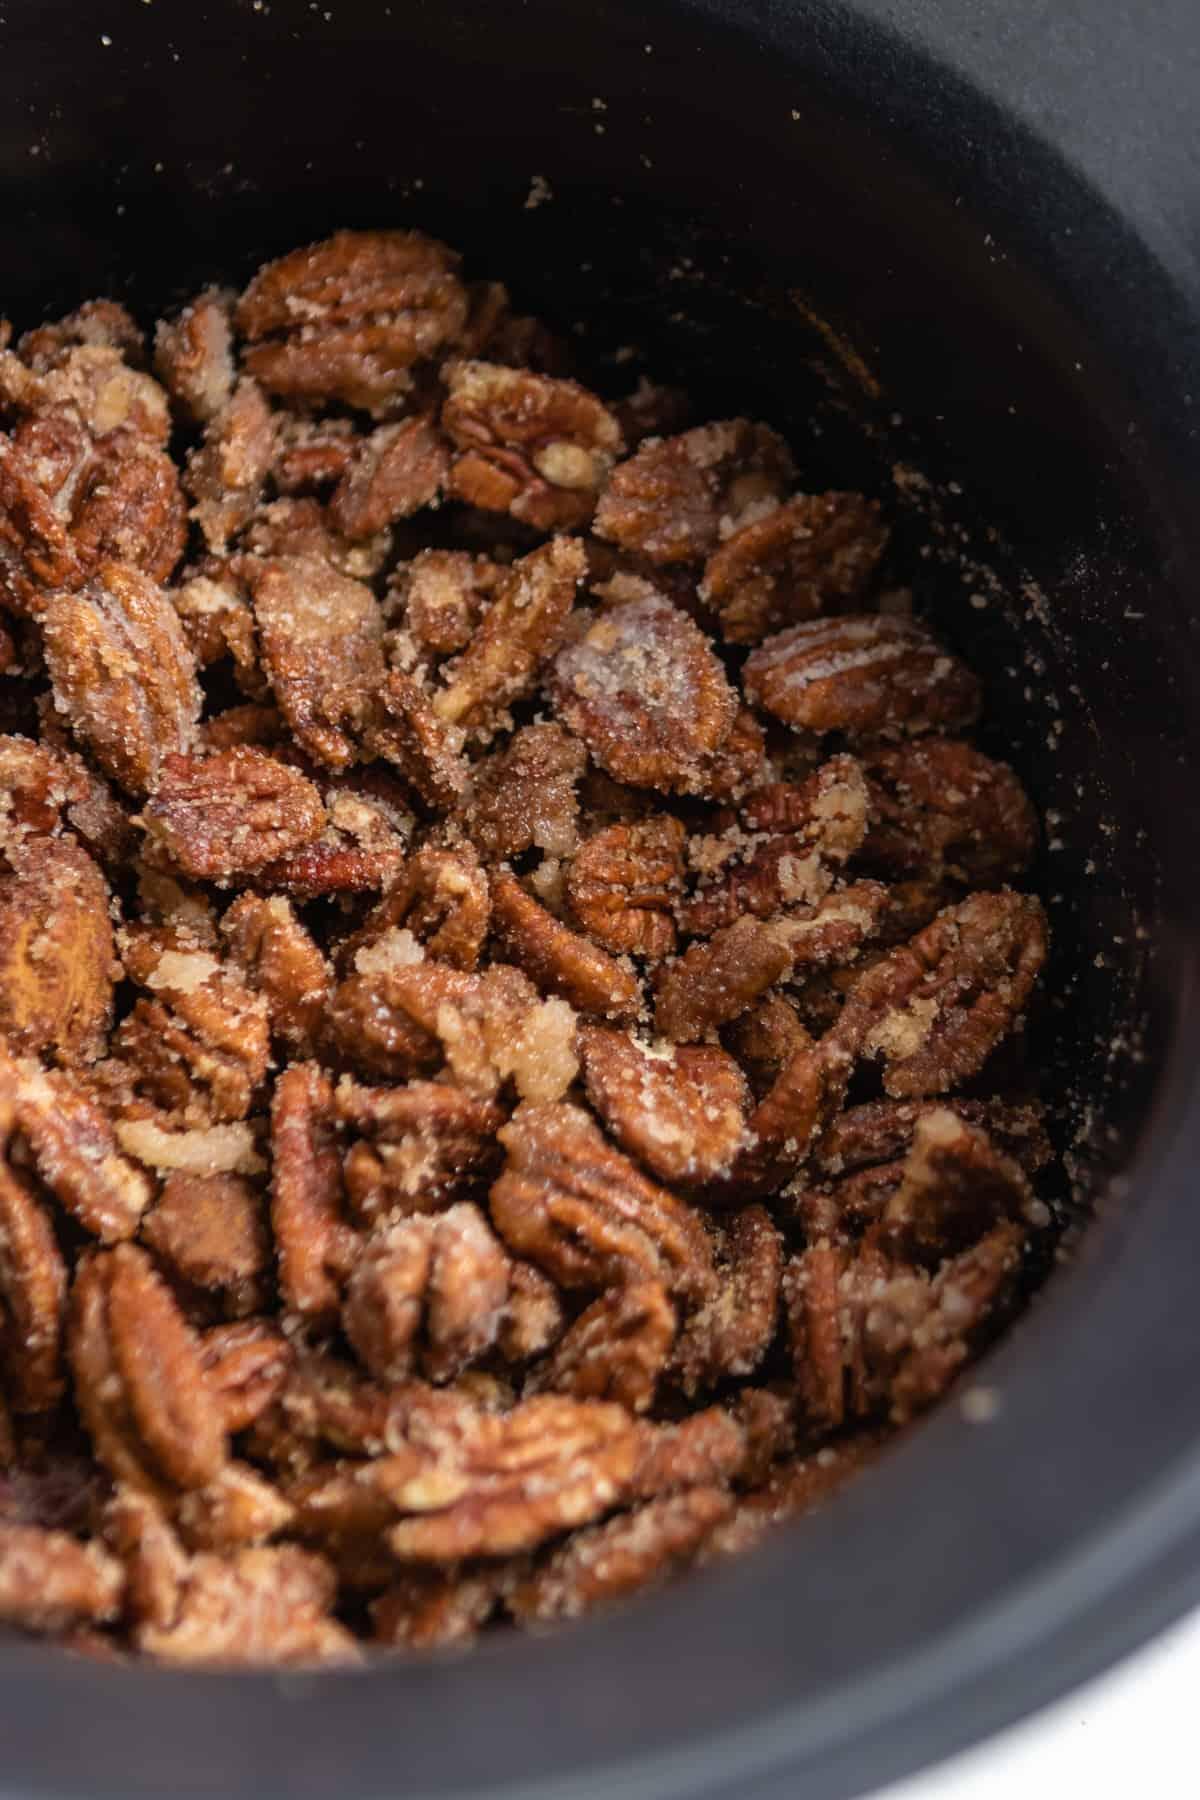 Cinnamon sugar coated pecans in slow cooker.